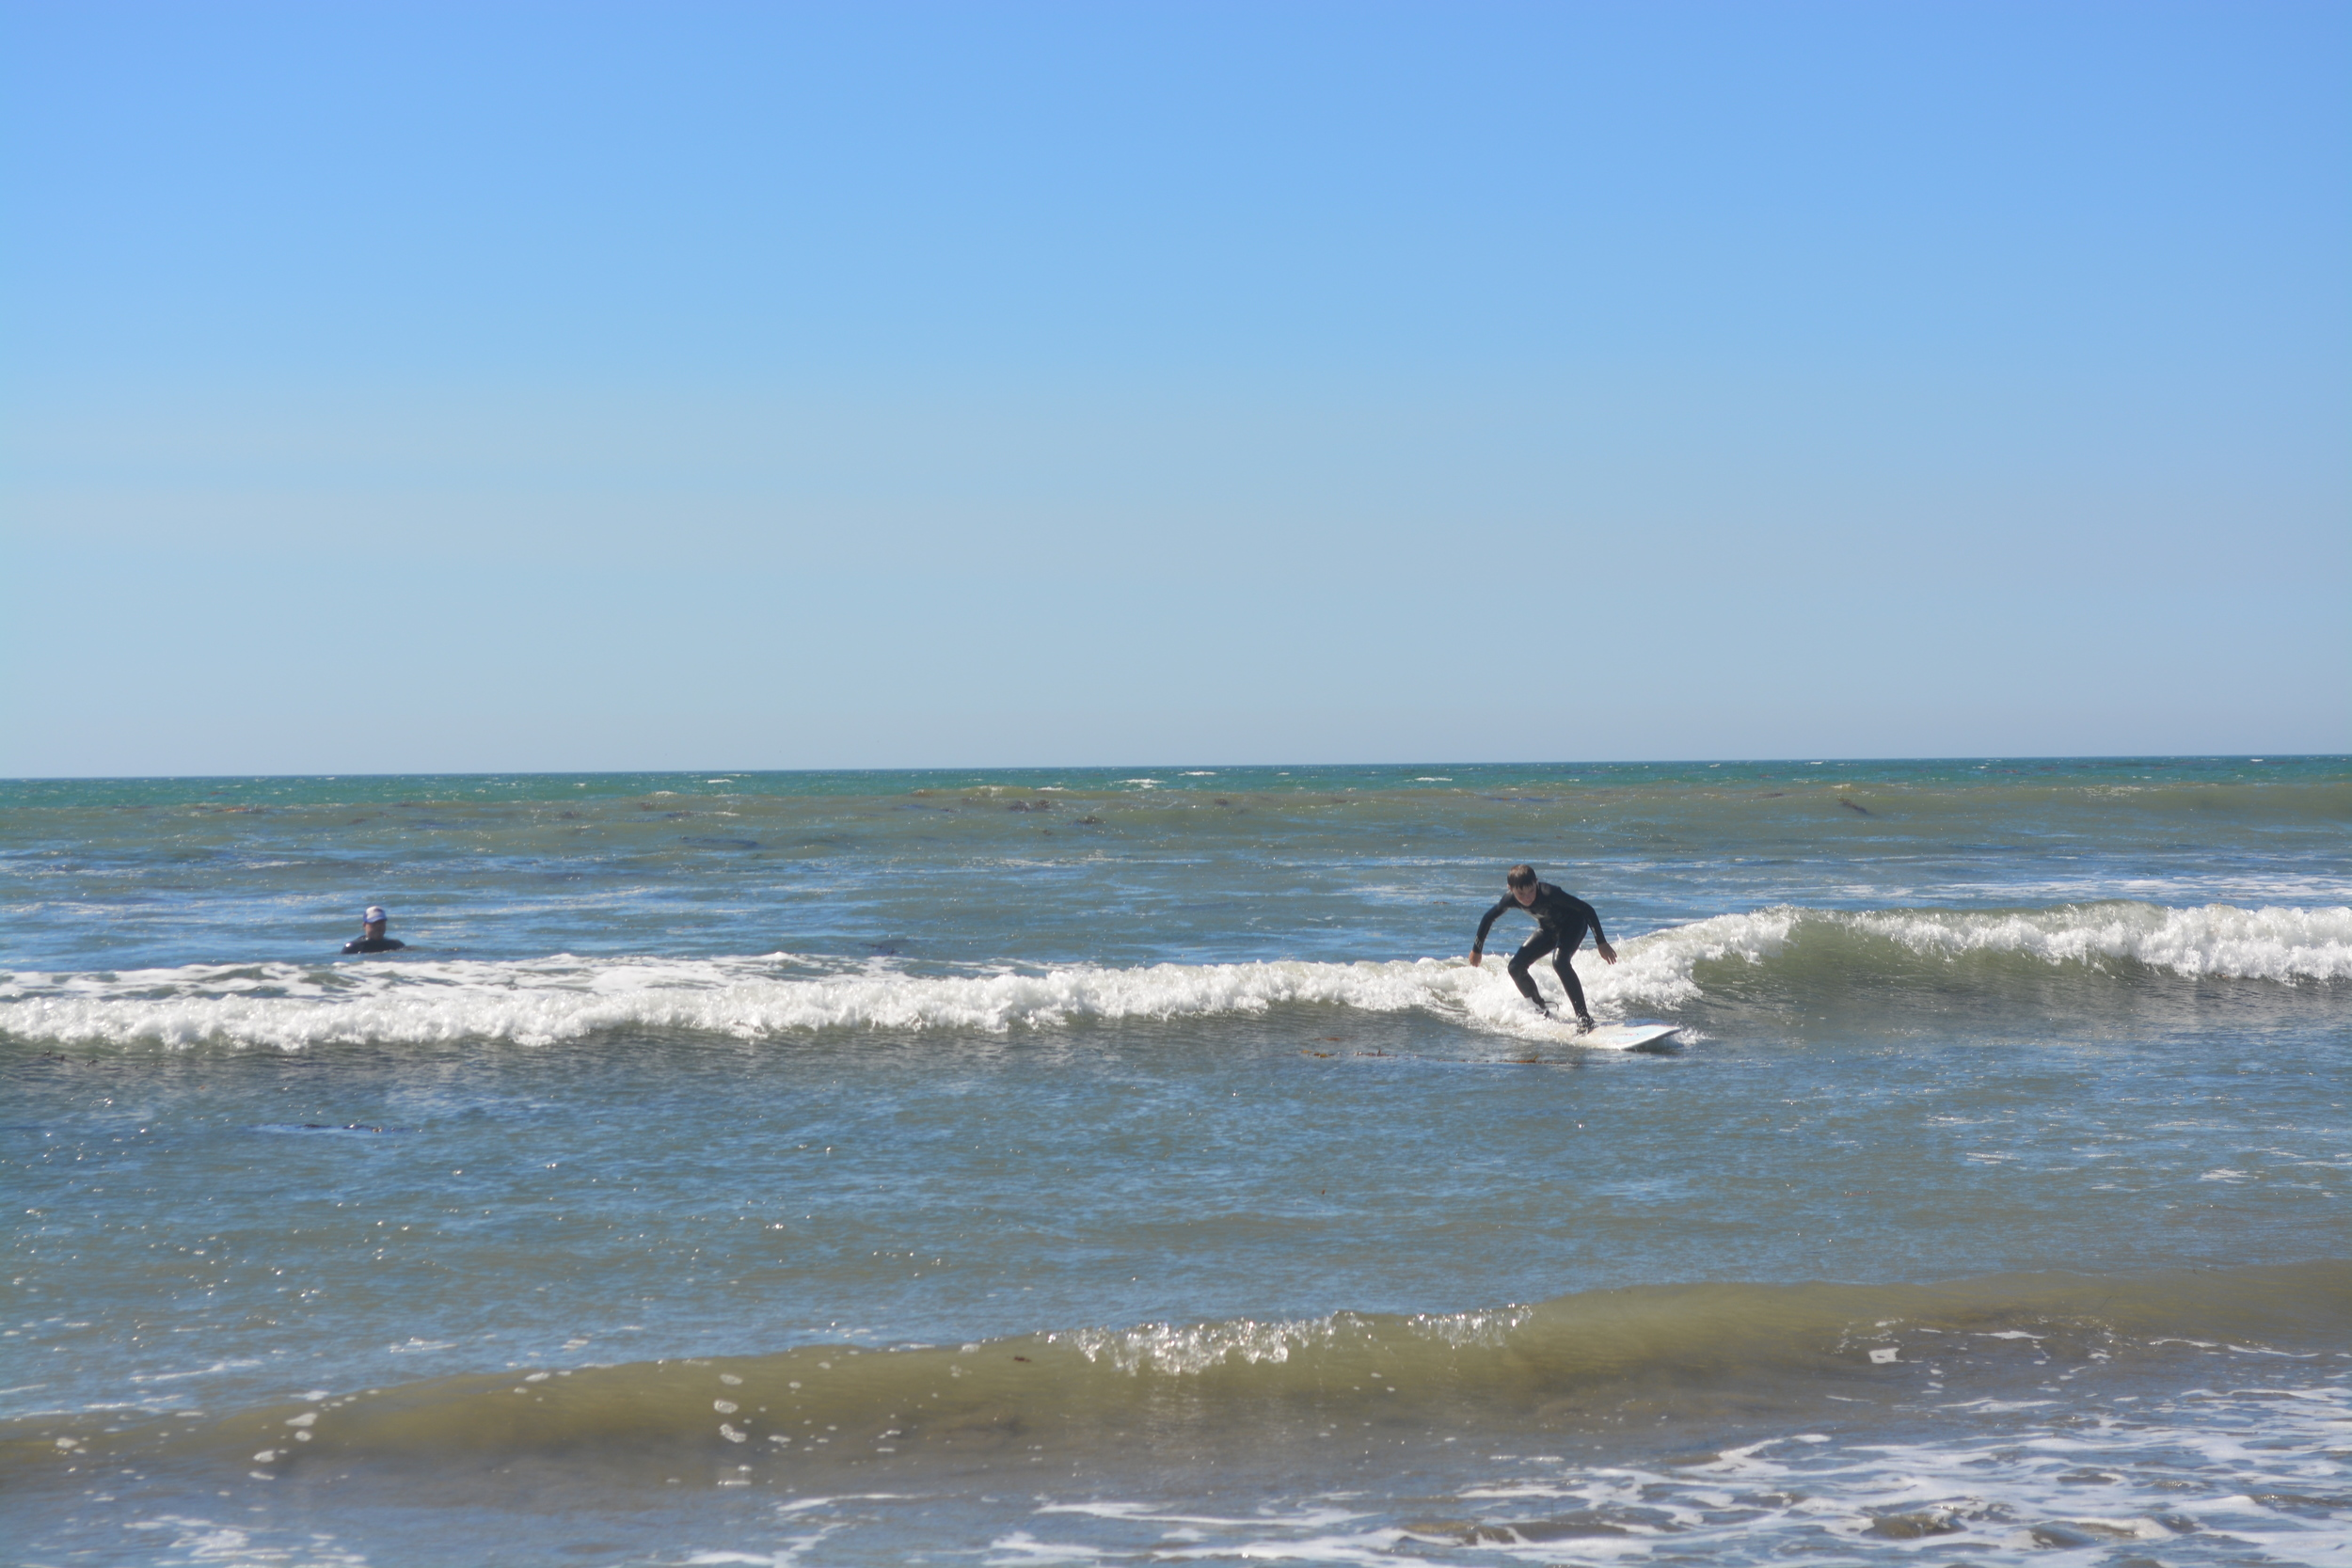 Baja California 10-5-13 Shipwrecks Surfing Adventure Ocean Experience Surf School San Diego (13).JPG